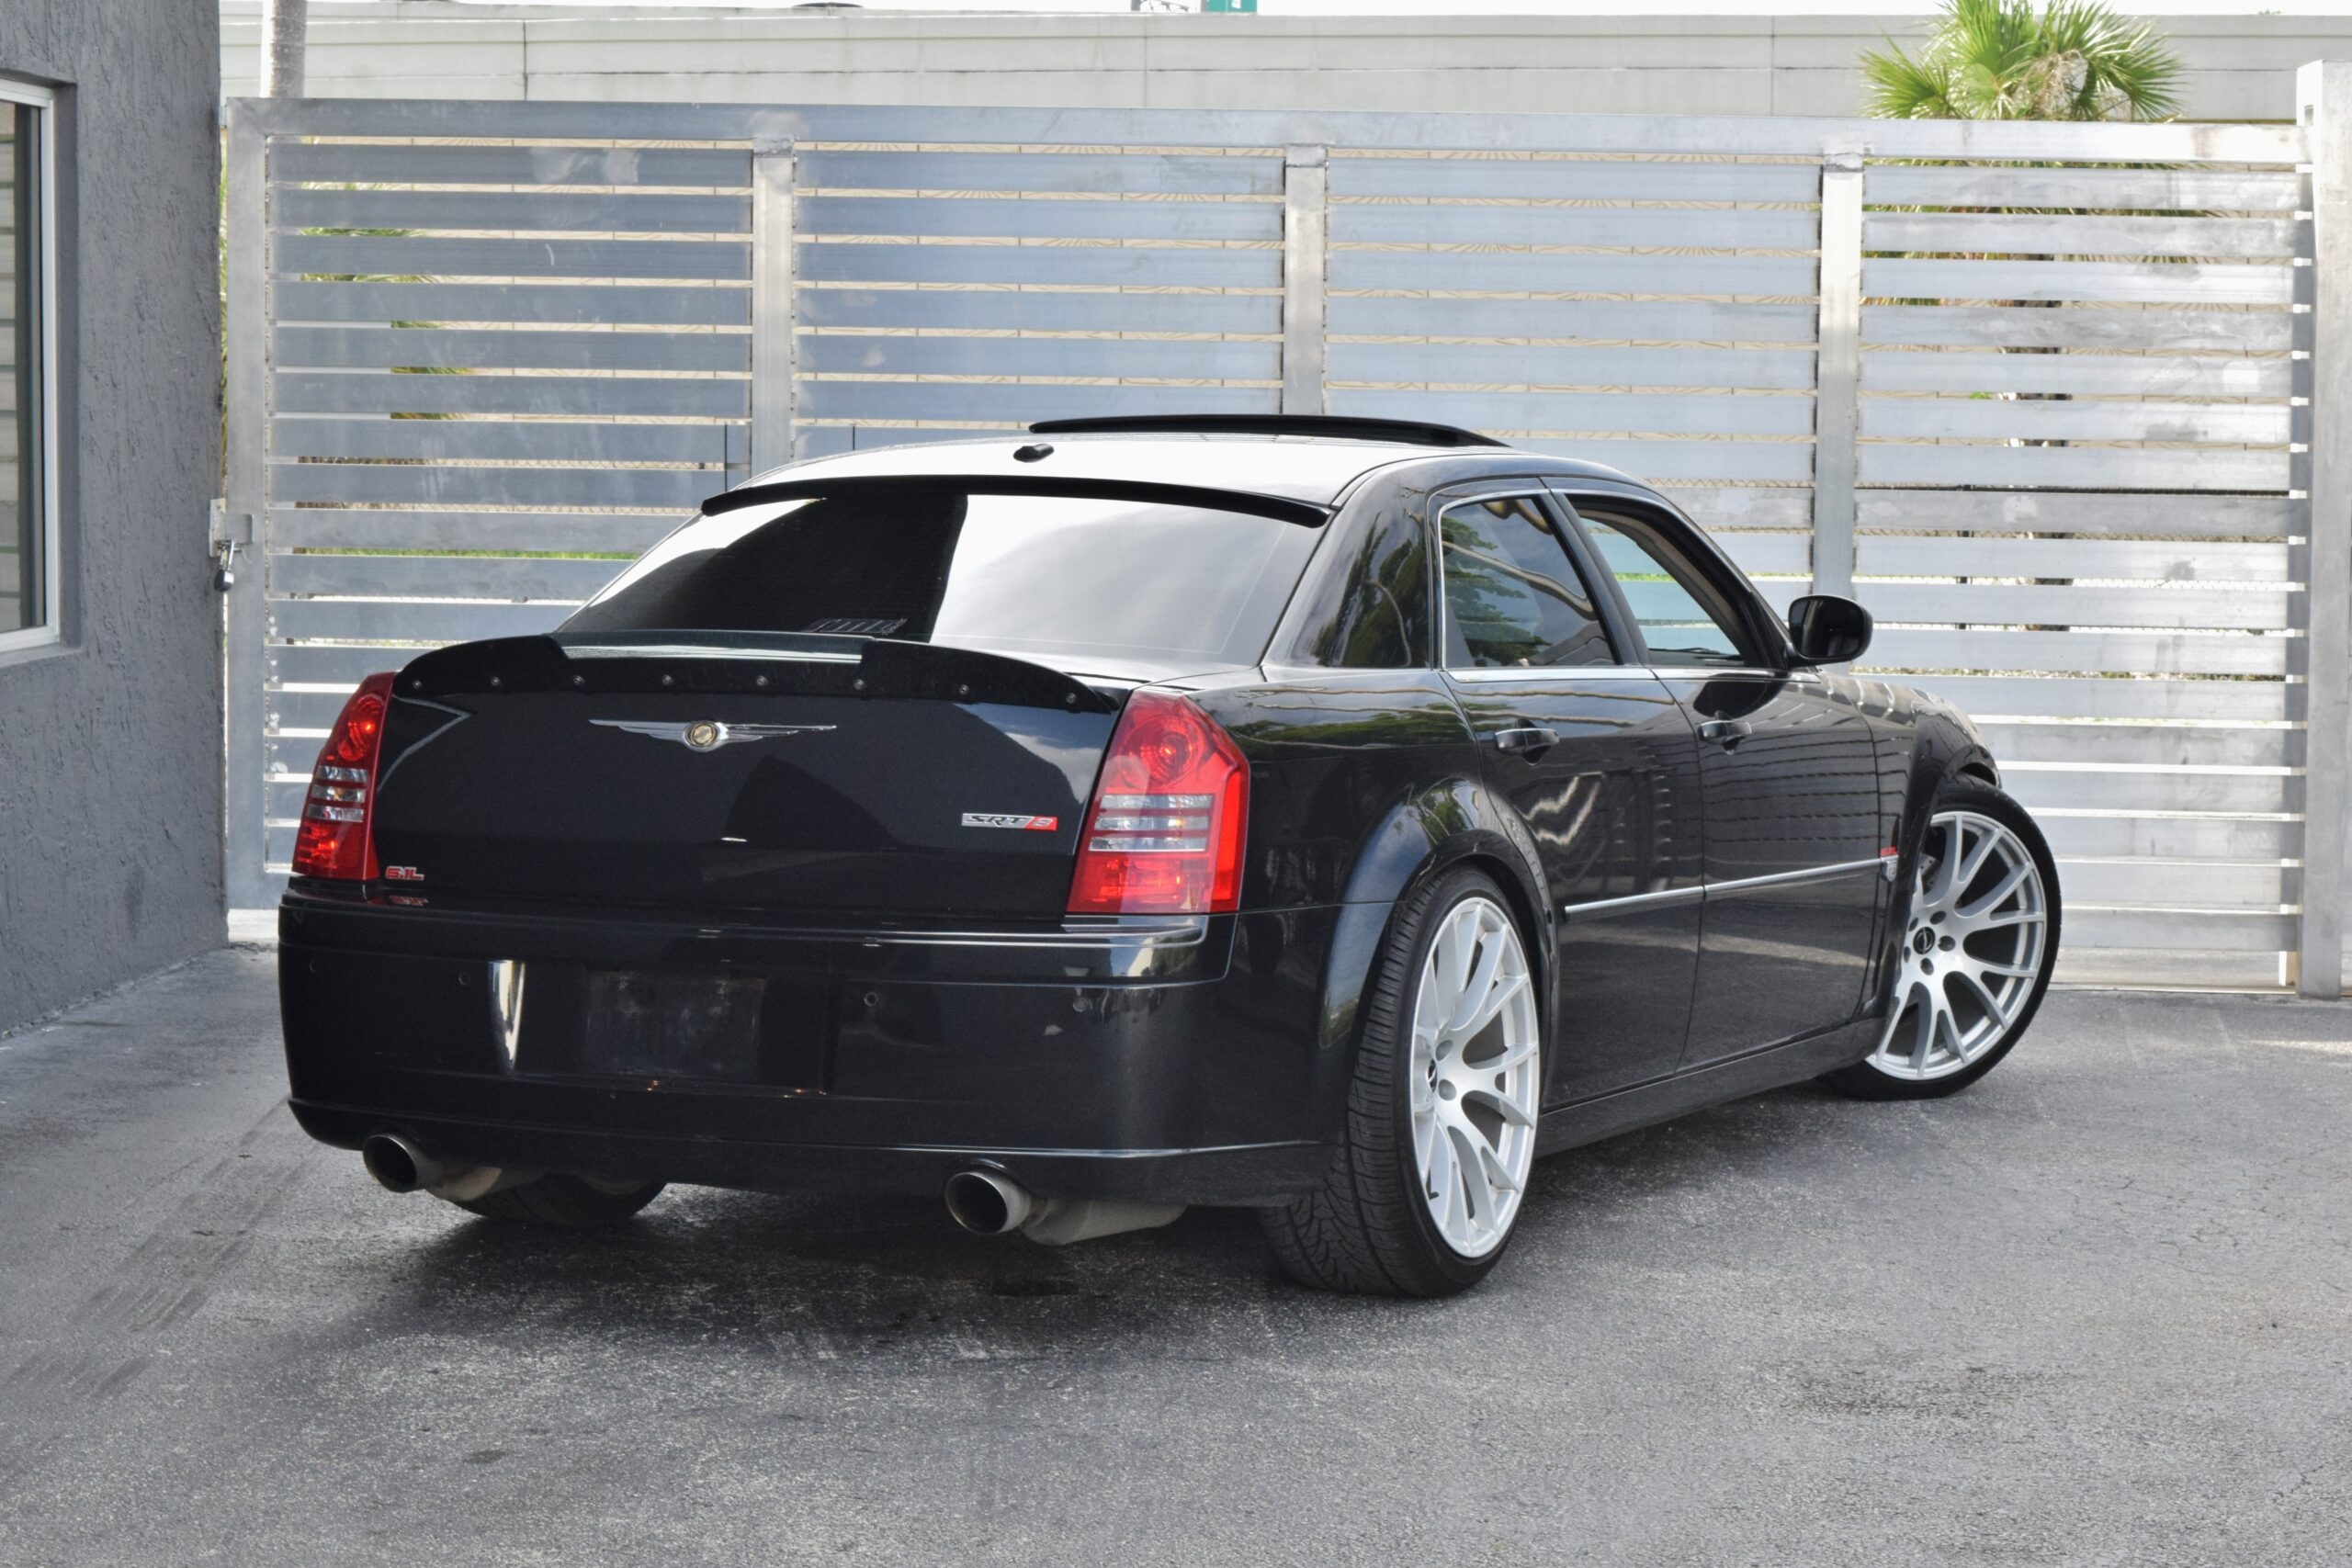 2006 Chrysler 300 Series SRT 8 HEMI V8-Well Sorted Mopar Mods-Low Miles-Clean History-Turn Key-Fresh Service